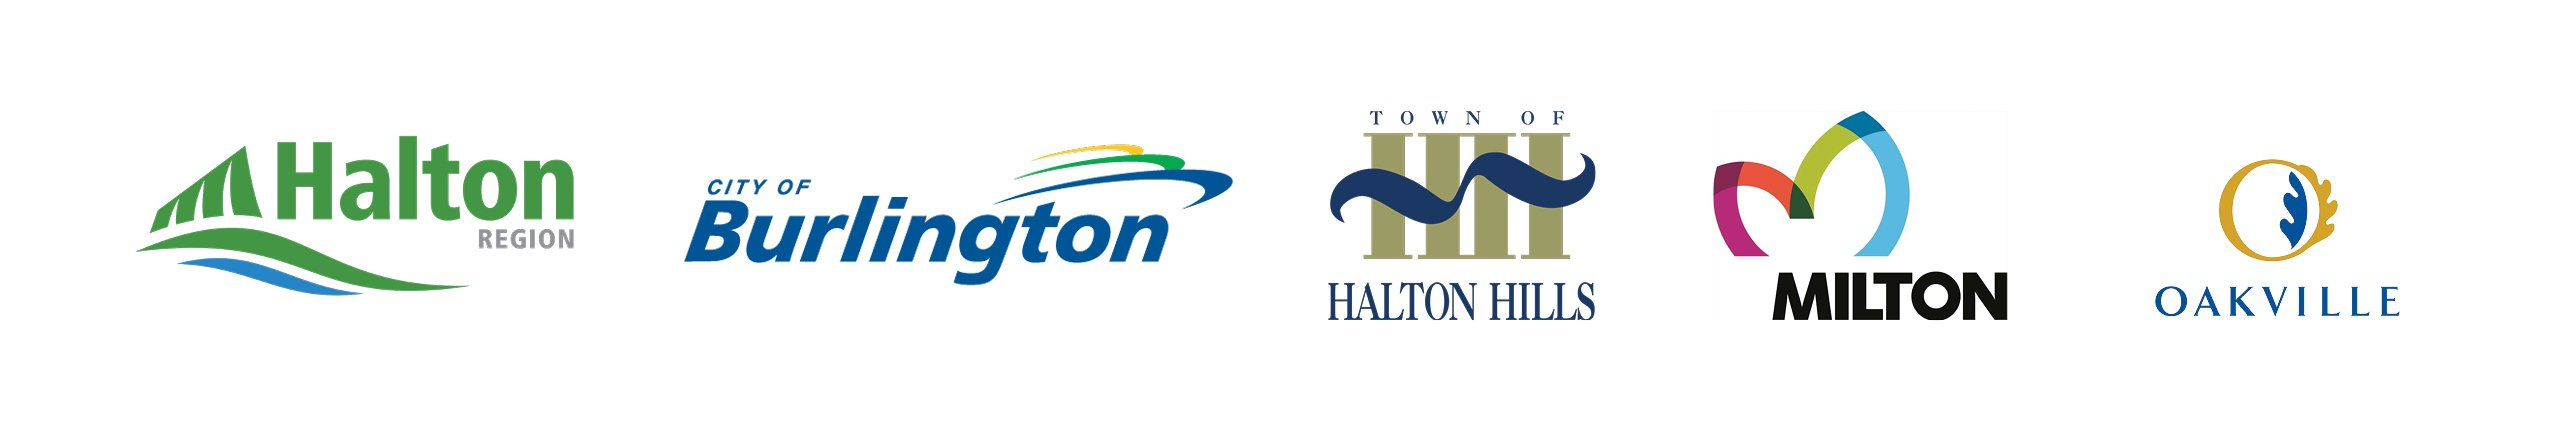 Halton Region Municipality Logos